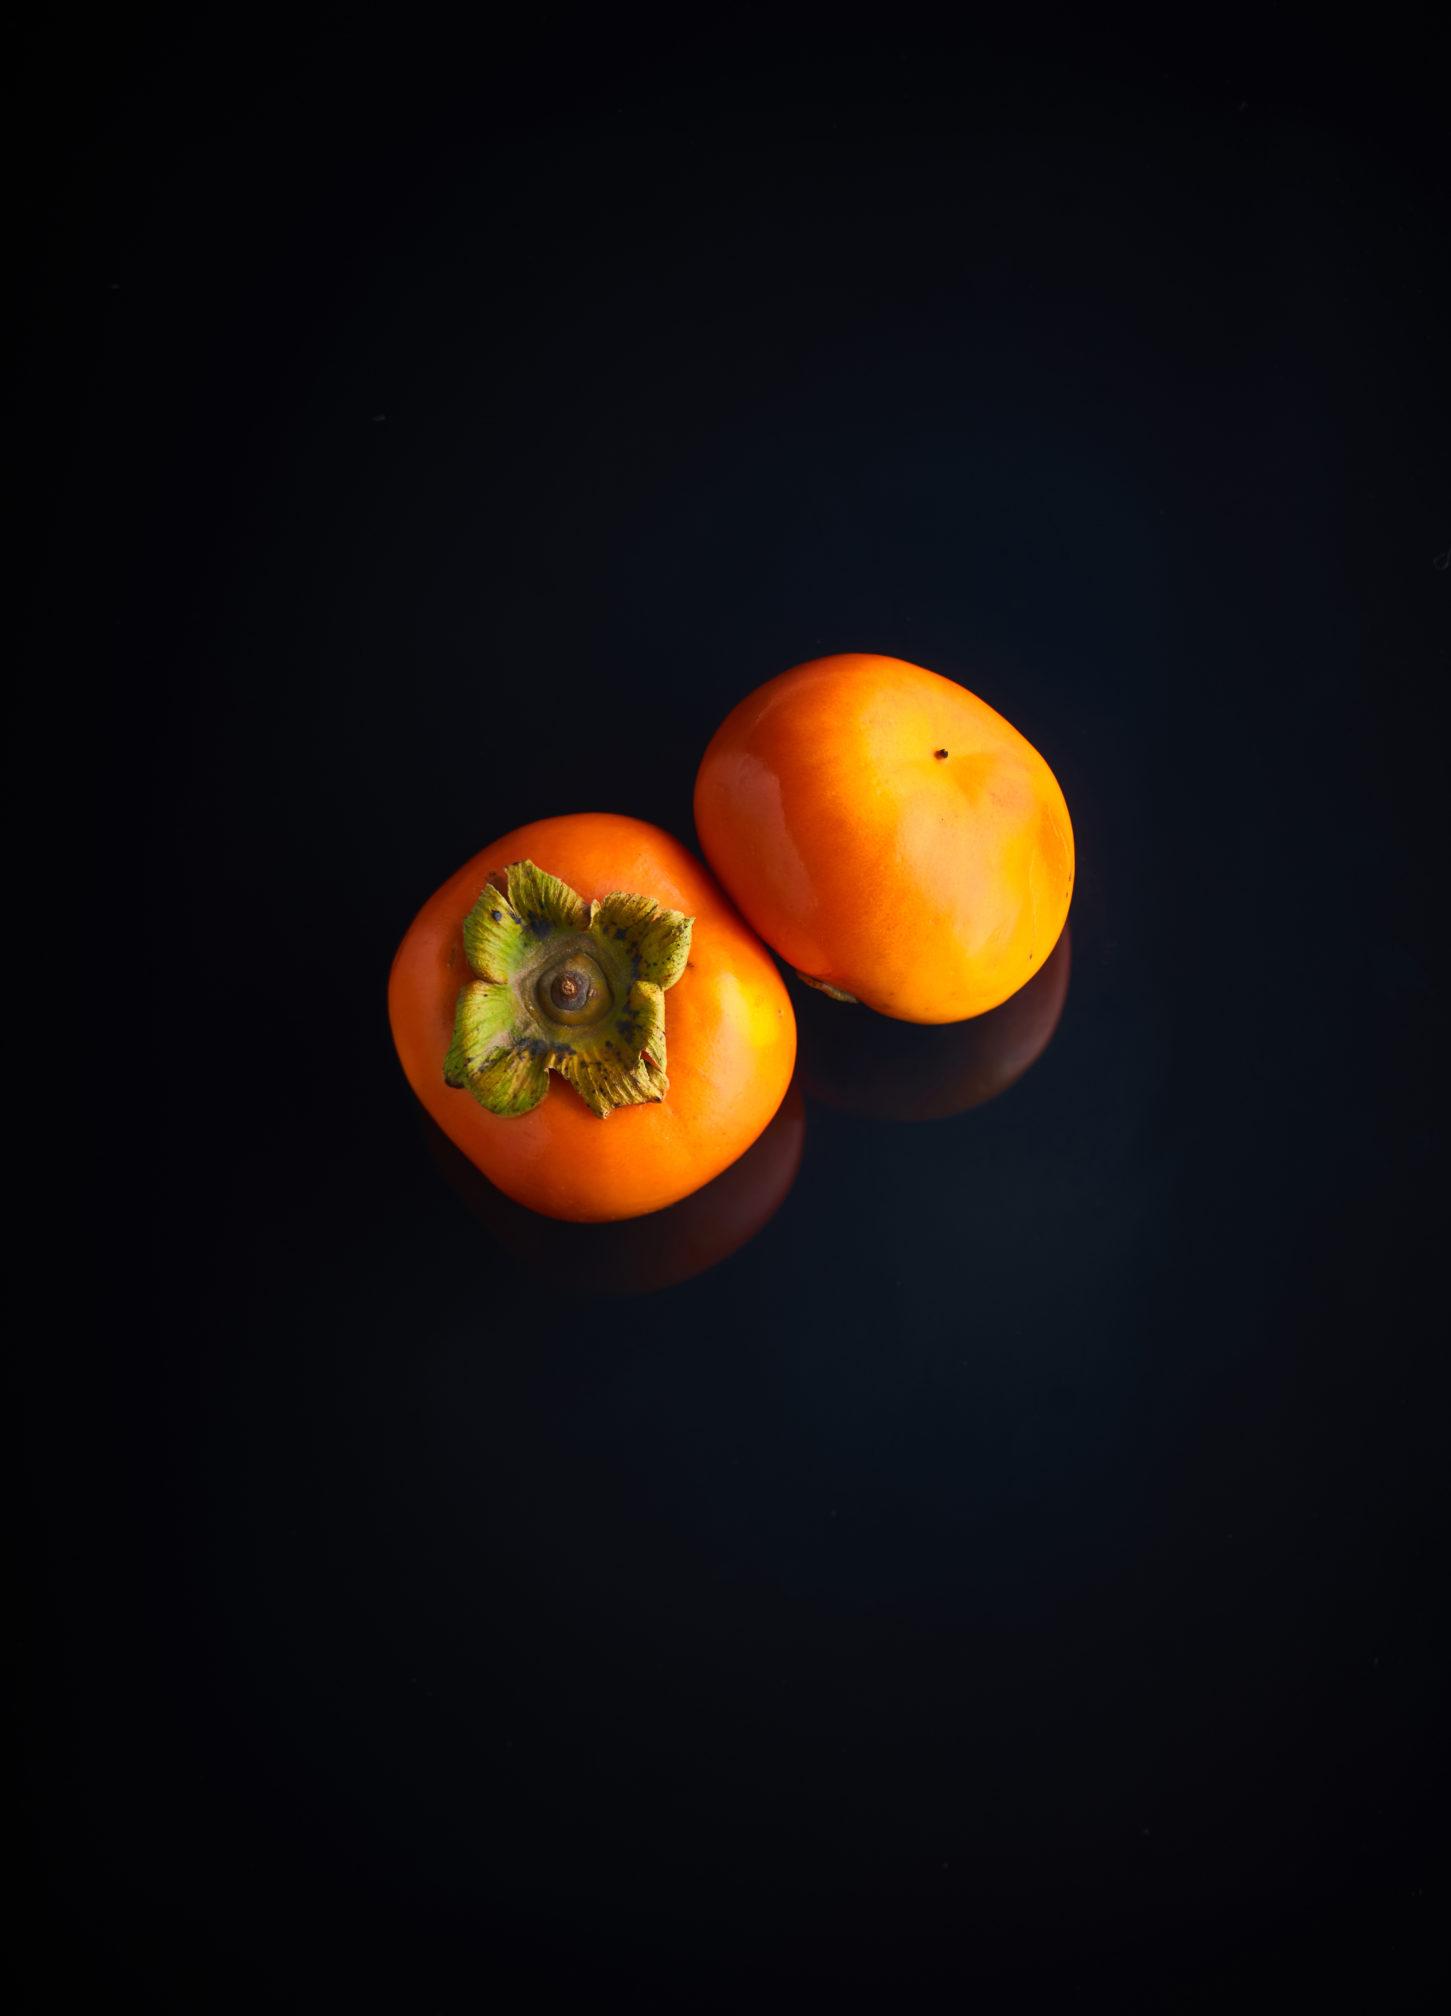 capexo-lilot-fruits-exotique-kaki-espagne-israel